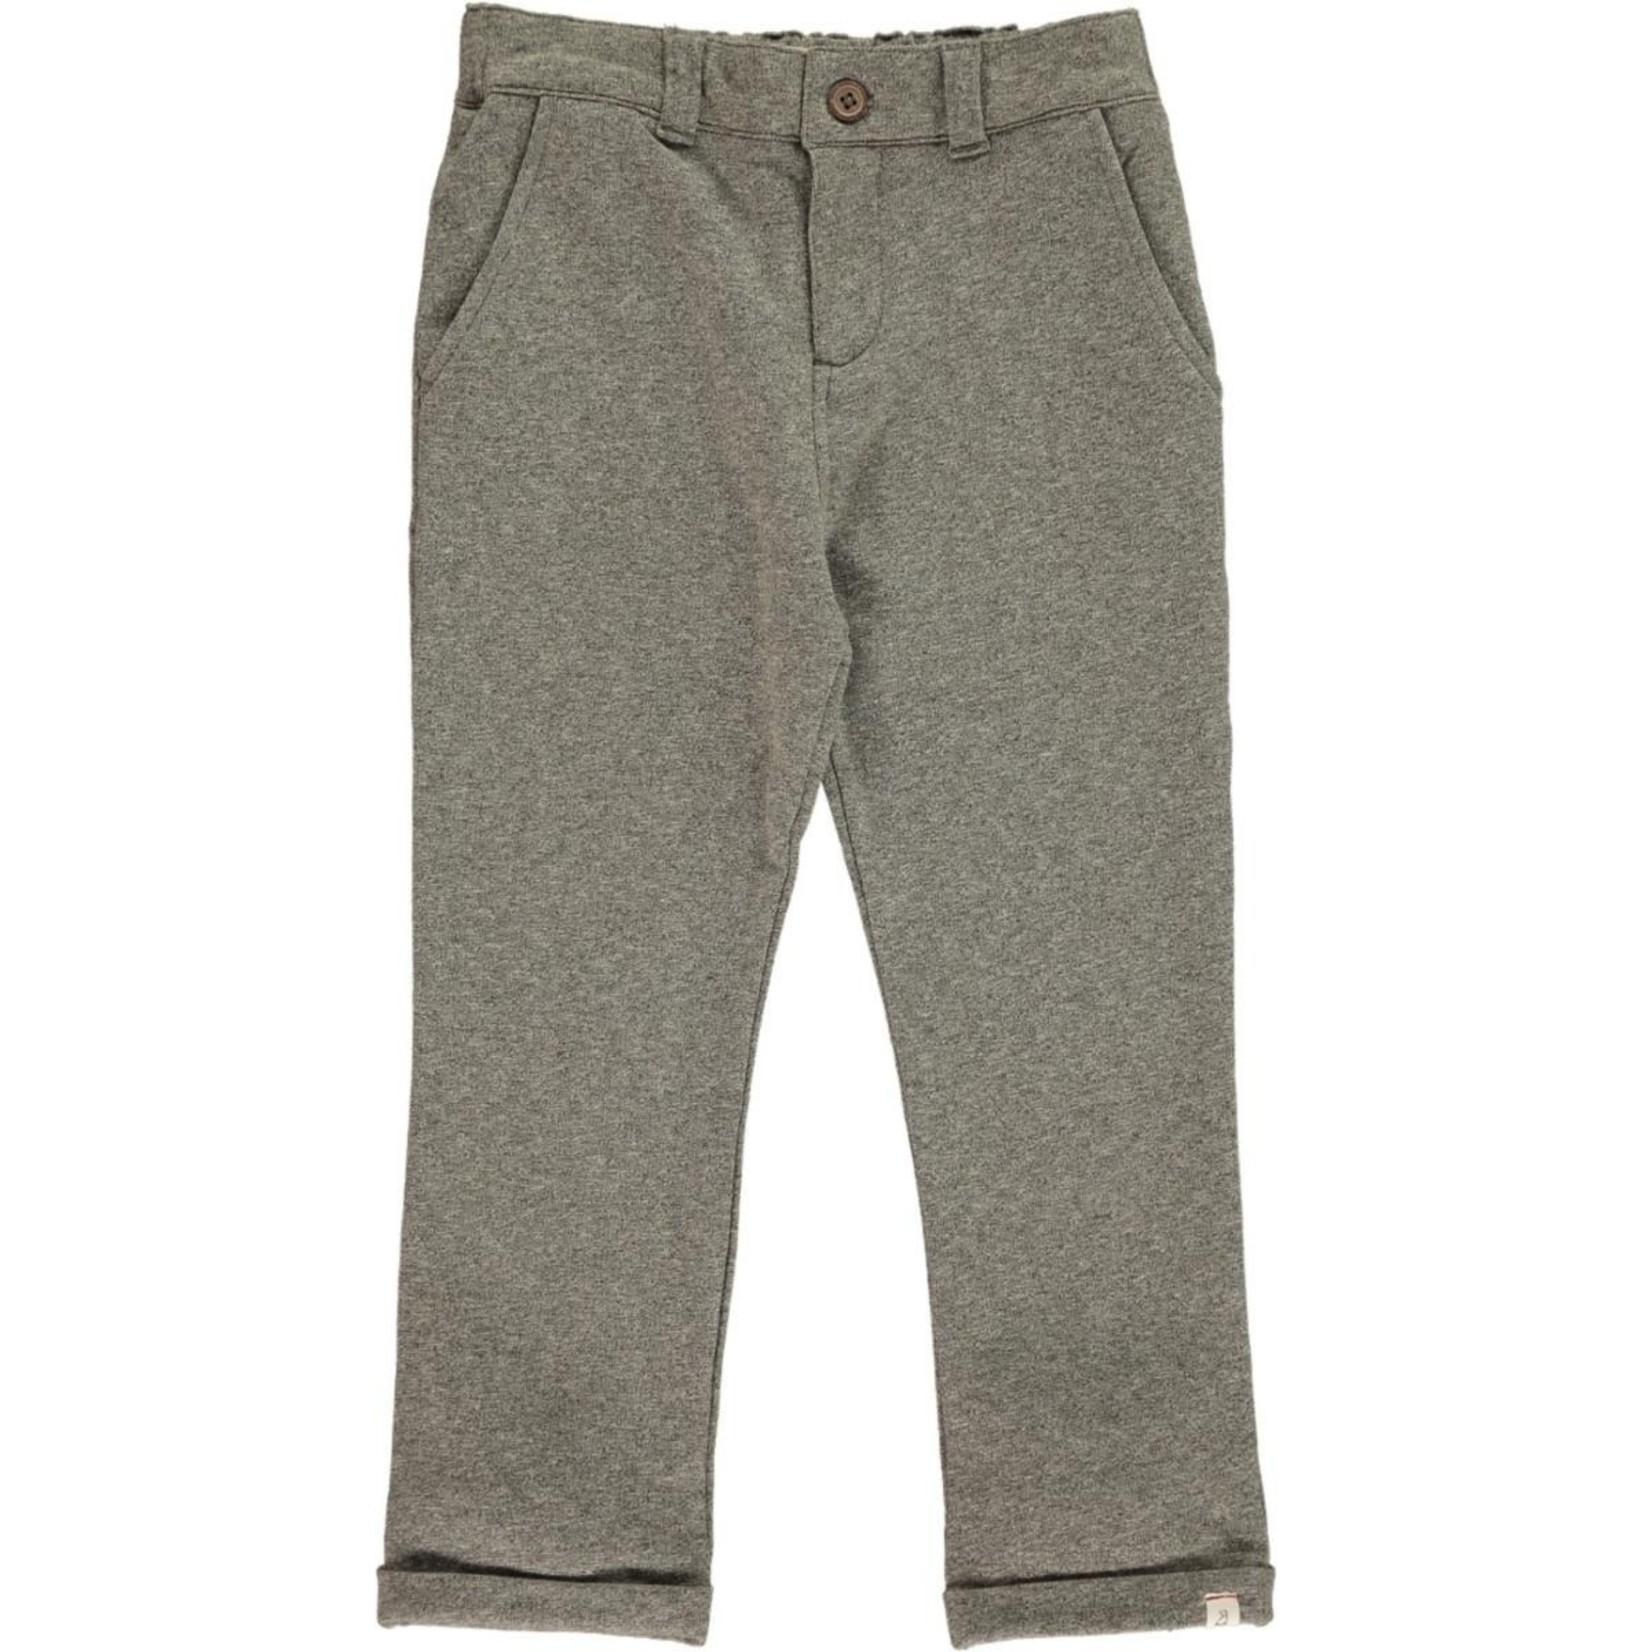 Me + Henry Jonathan Jersey Pants Grey